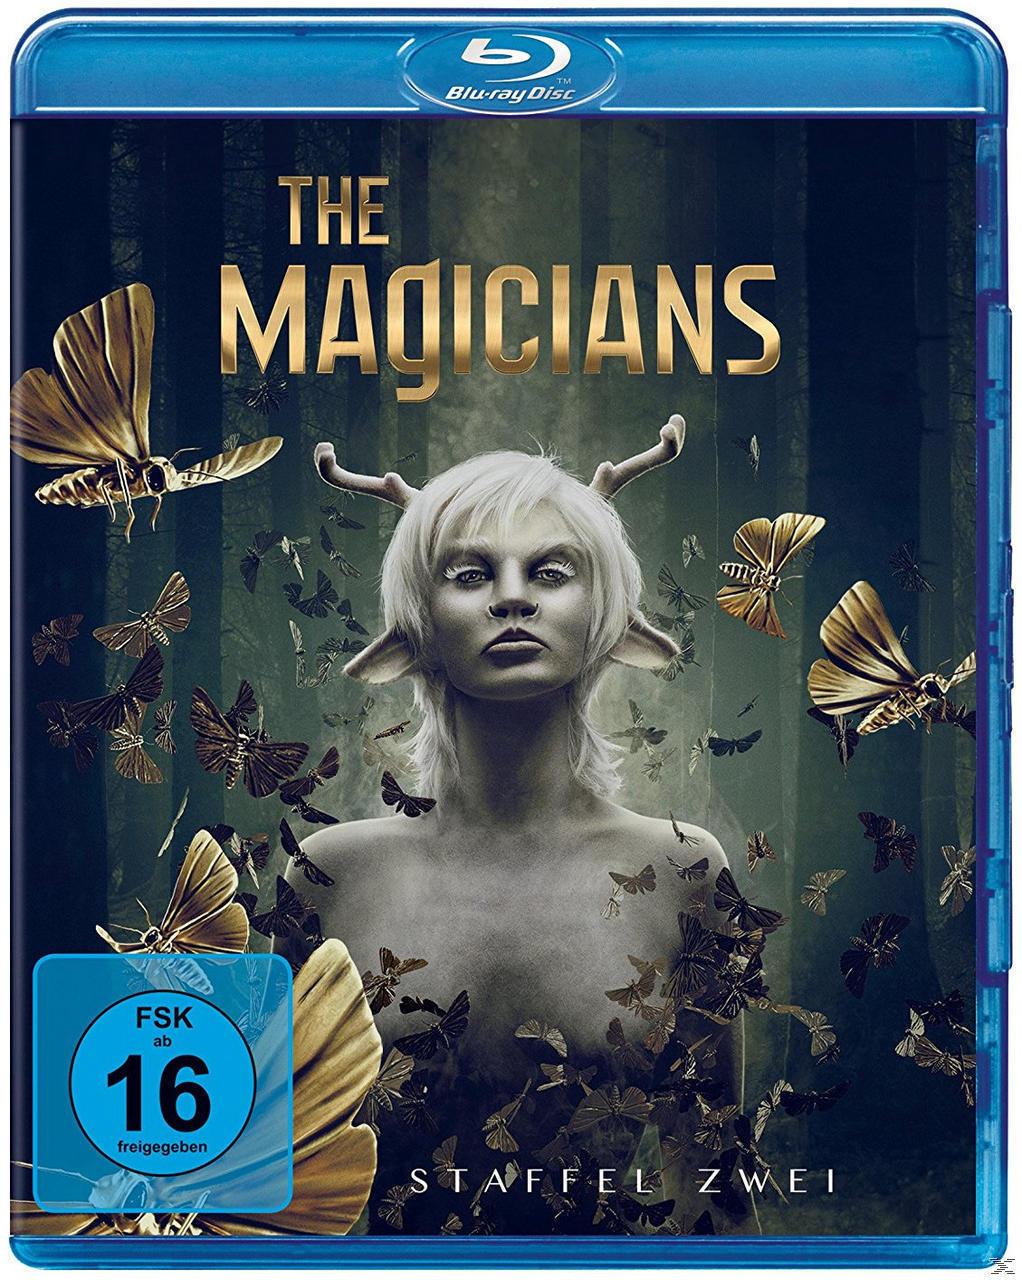 The Magicians - Staffel 2 BLU-RAY Box (BLU-RAY) für 27,99 Euro